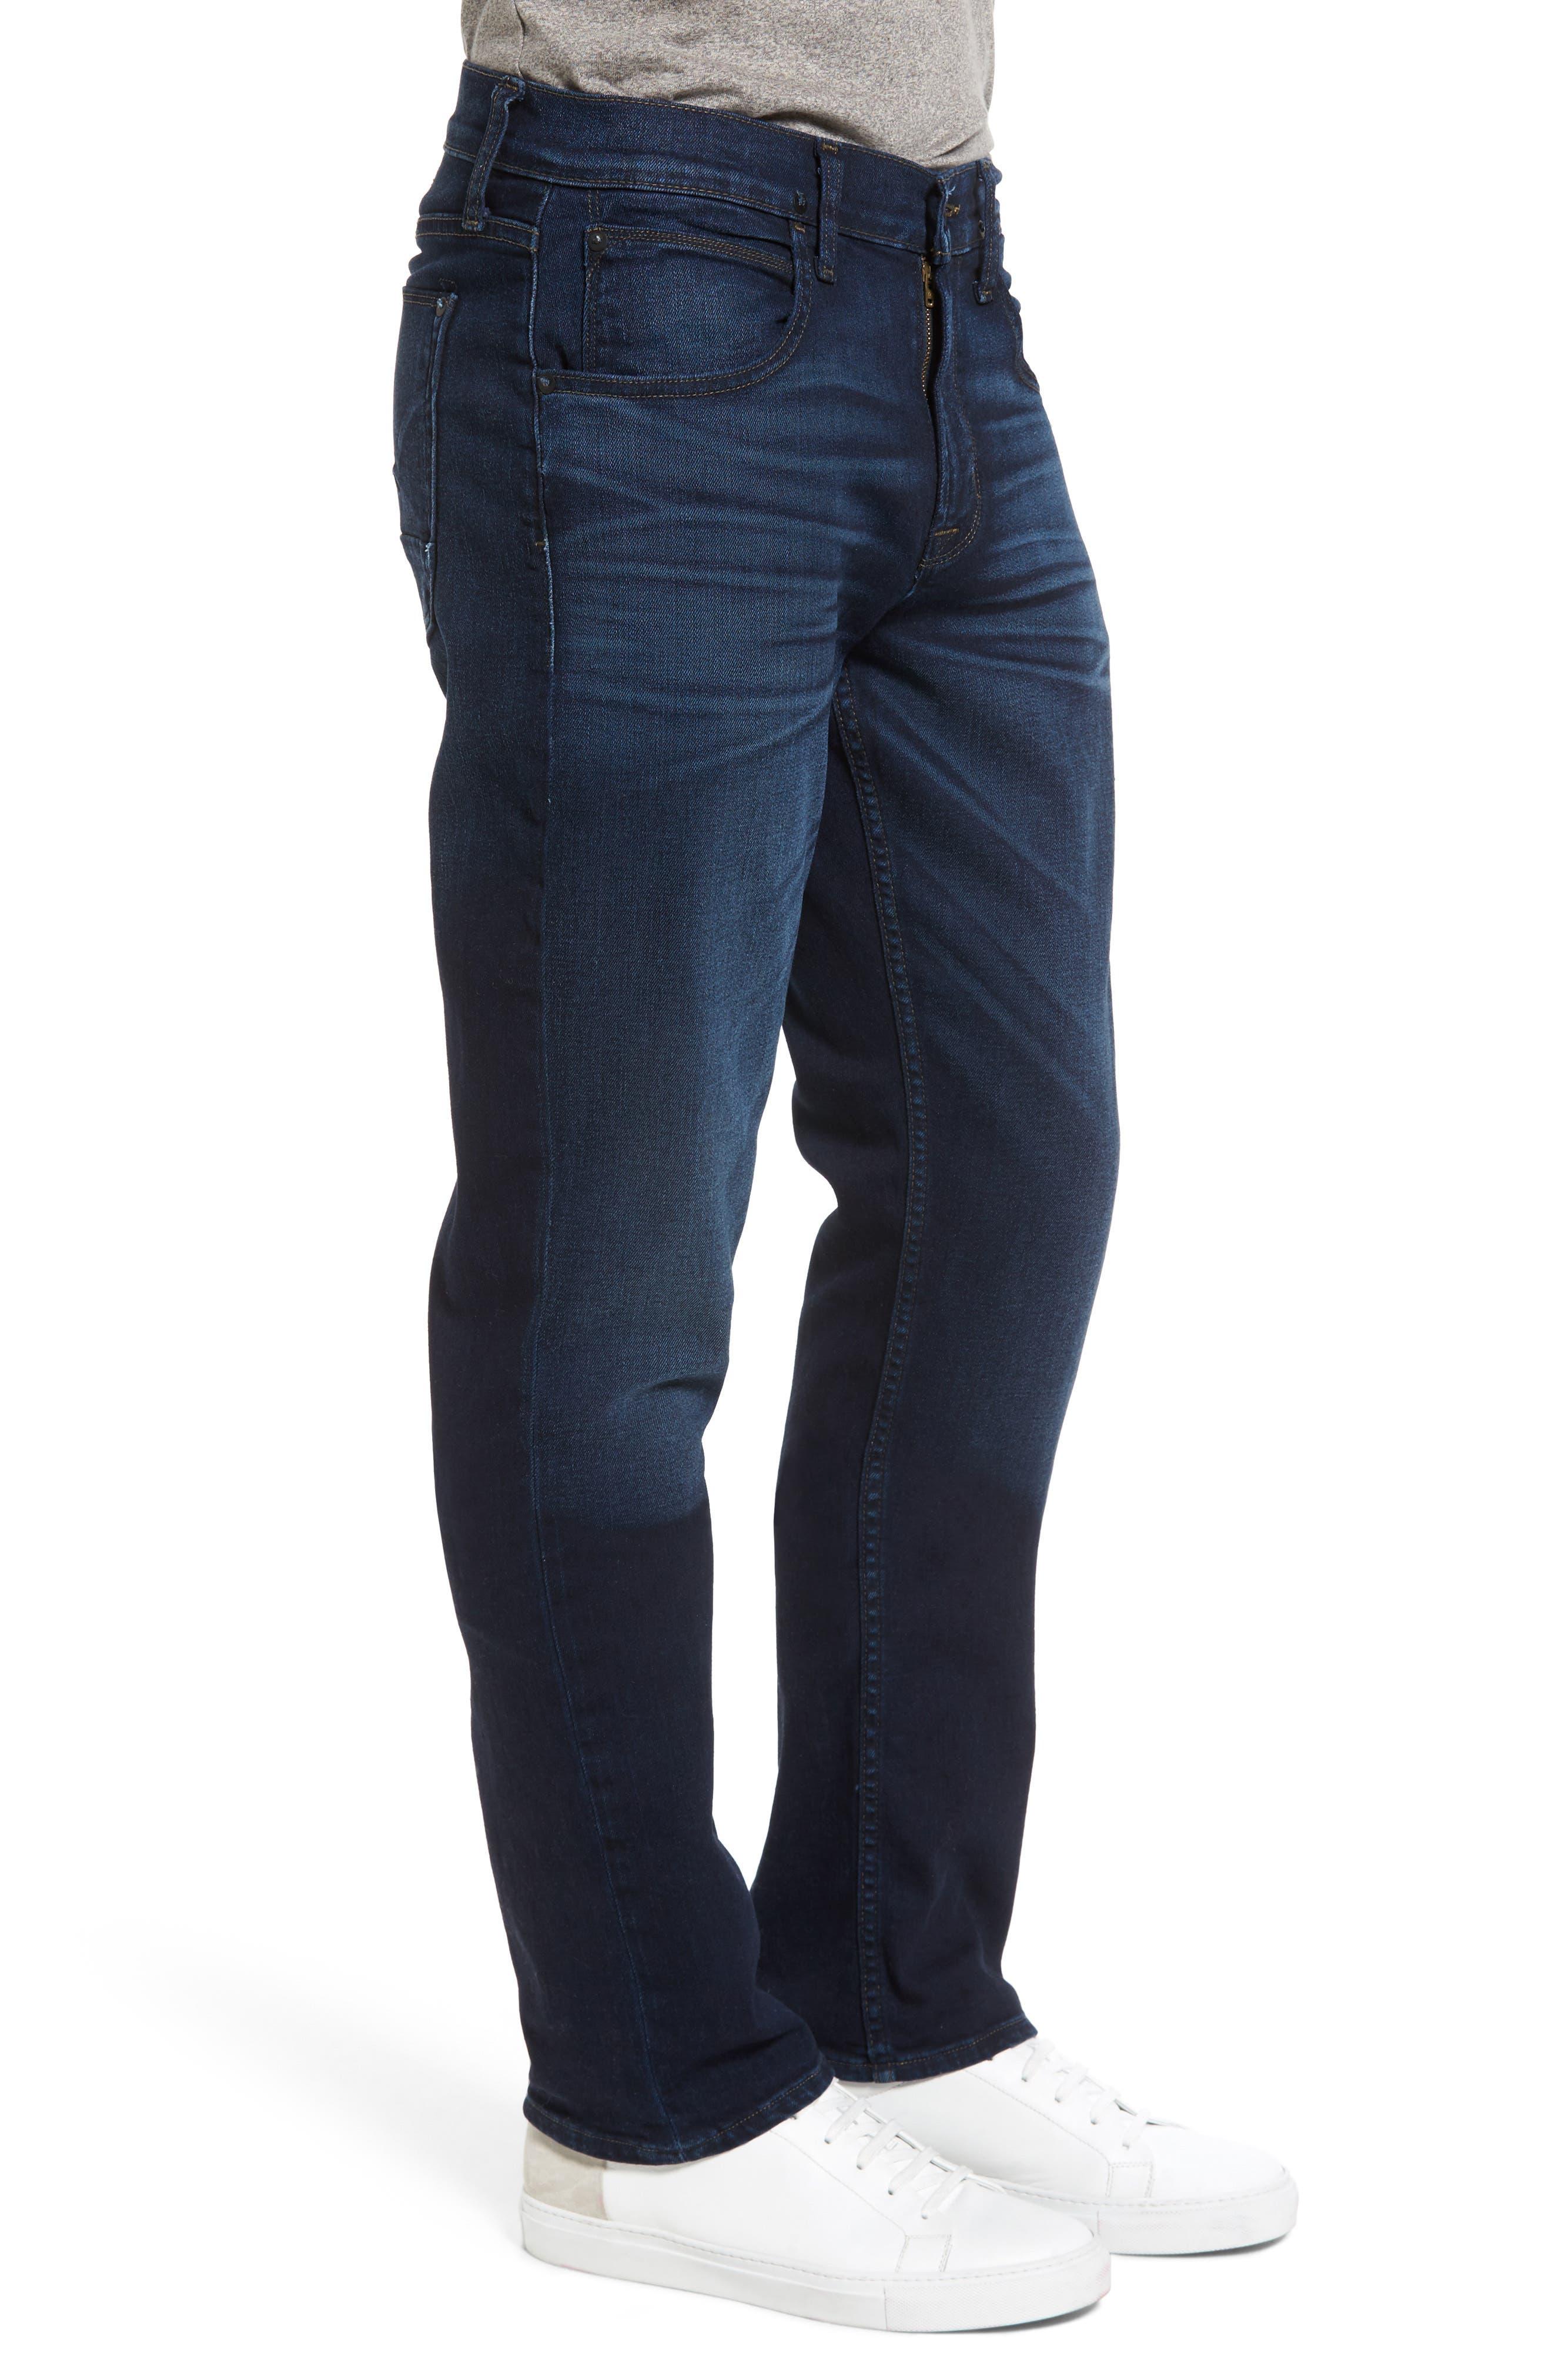 Byron Slim Straight Leg Jeans,                             Alternate thumbnail 3, color,                             401